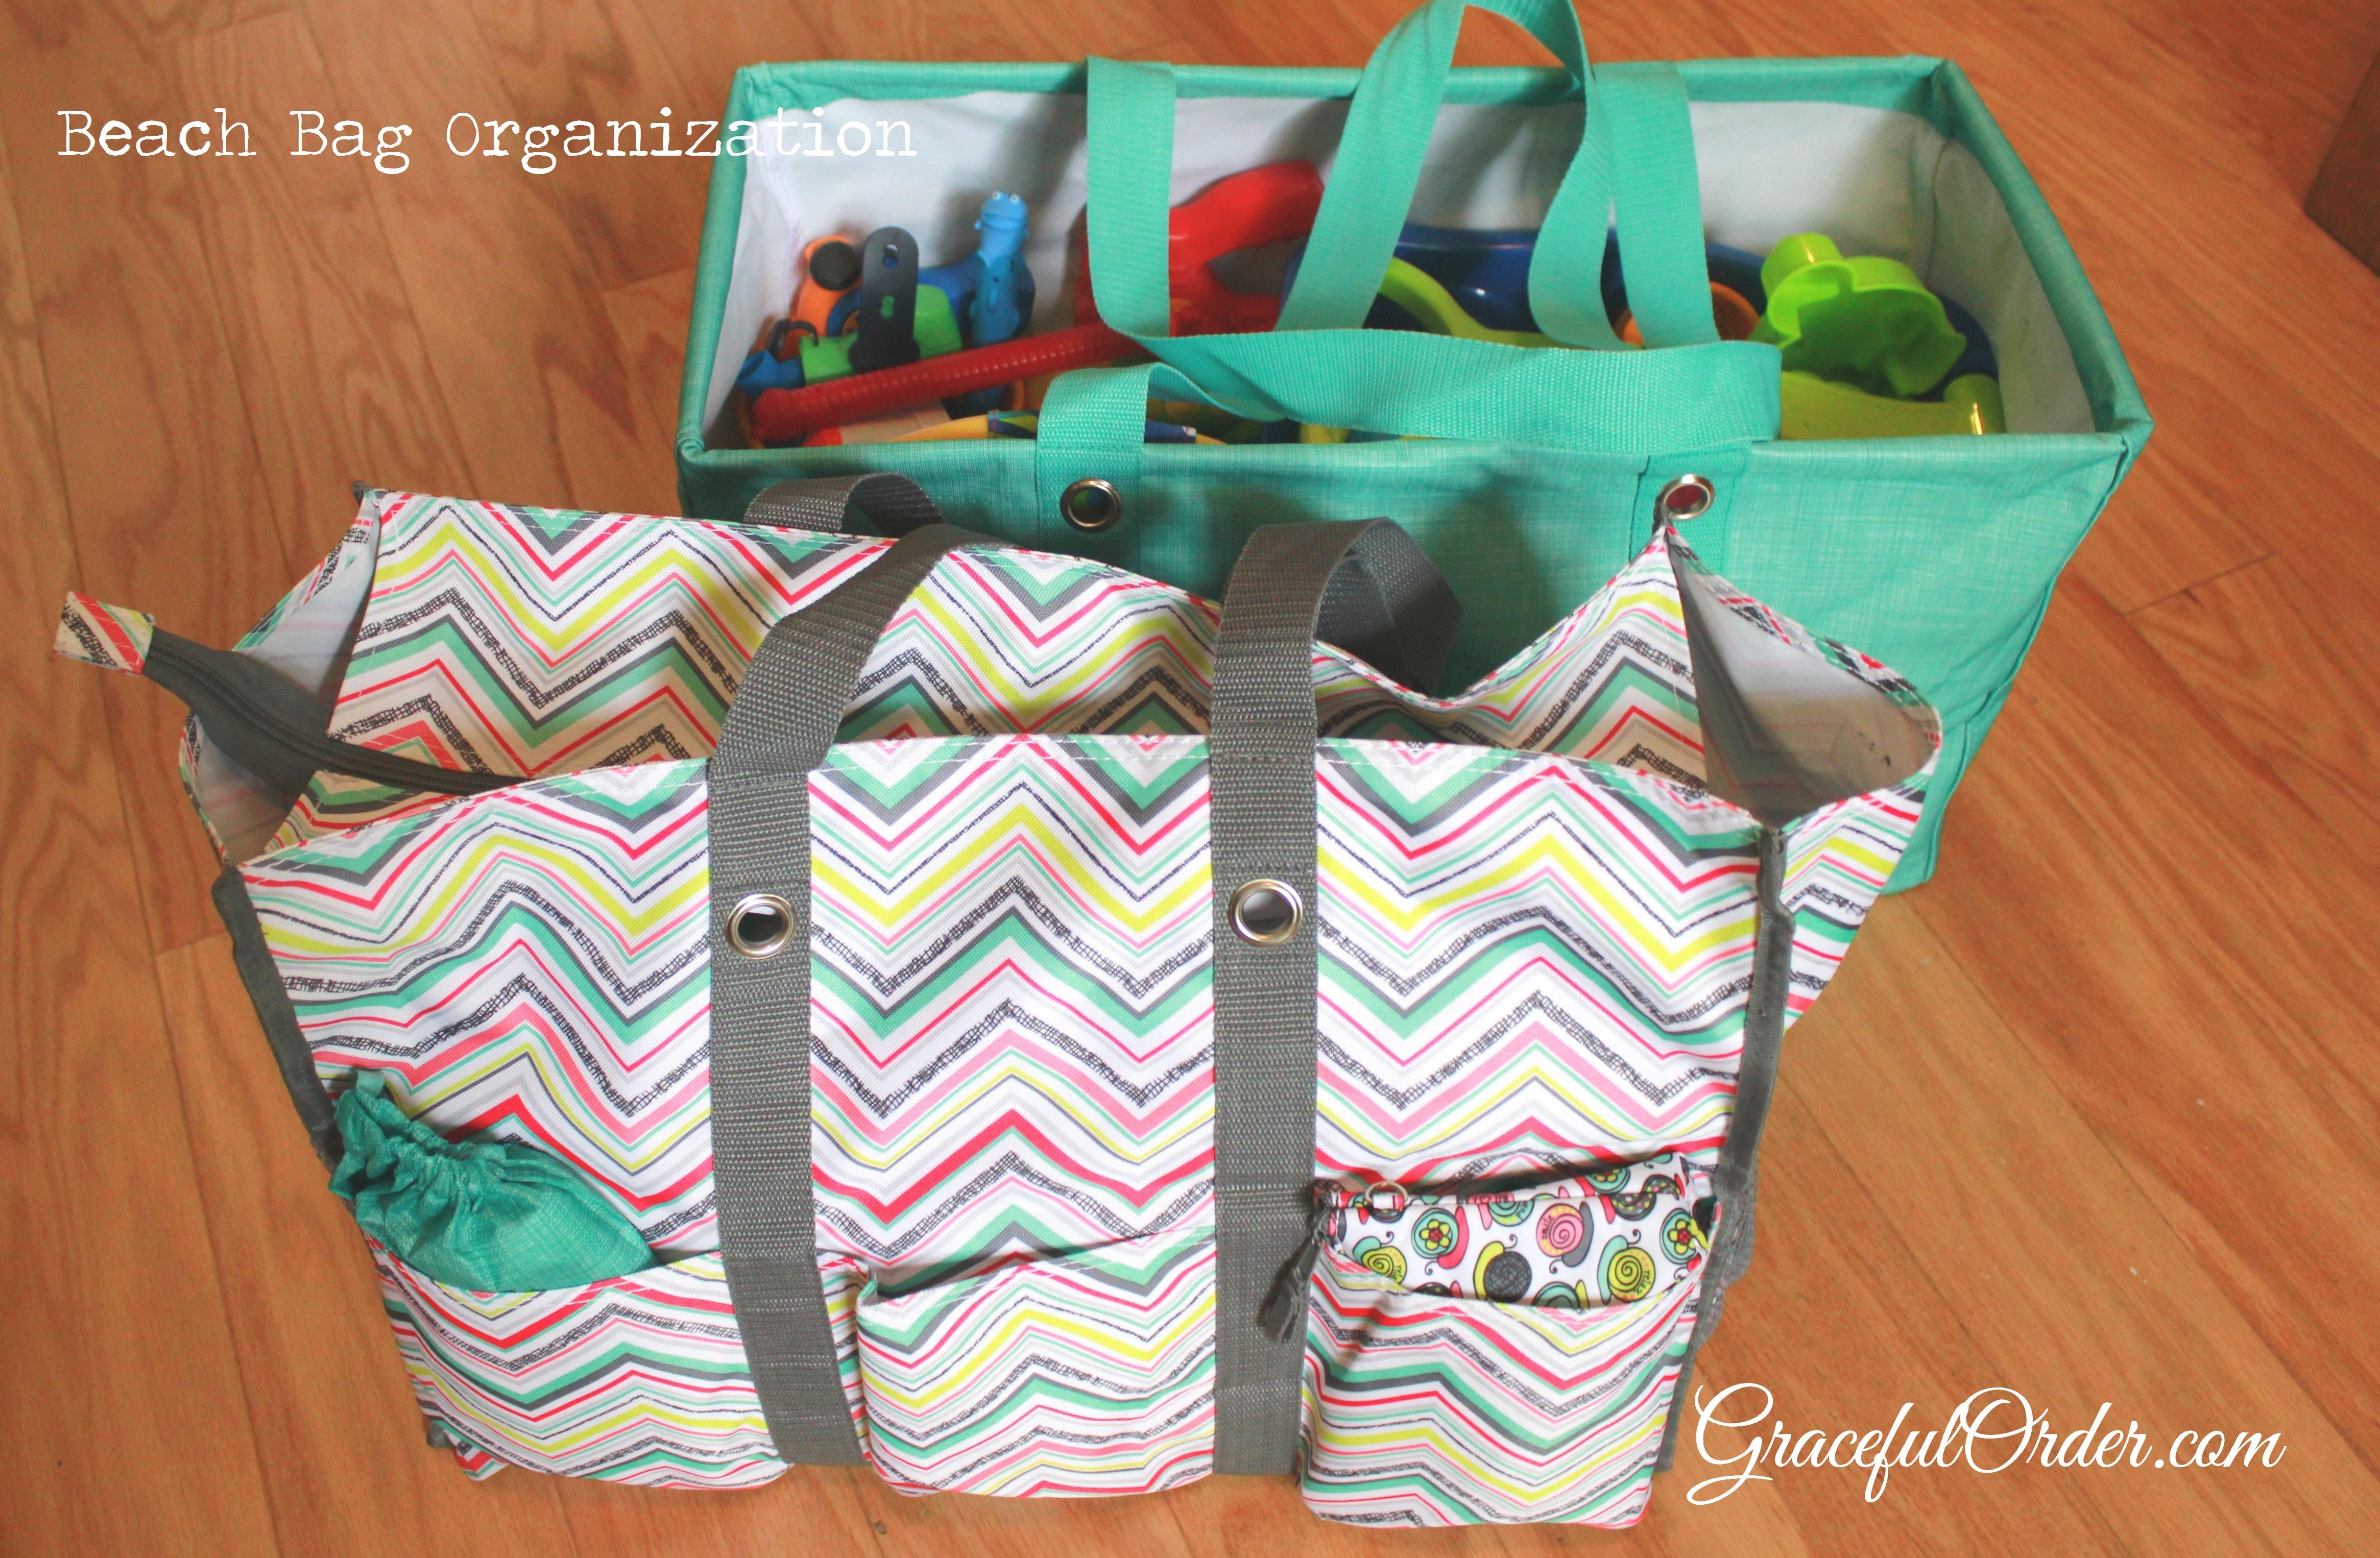 92763c5de7 Beach Bag Organization - Graceful Order